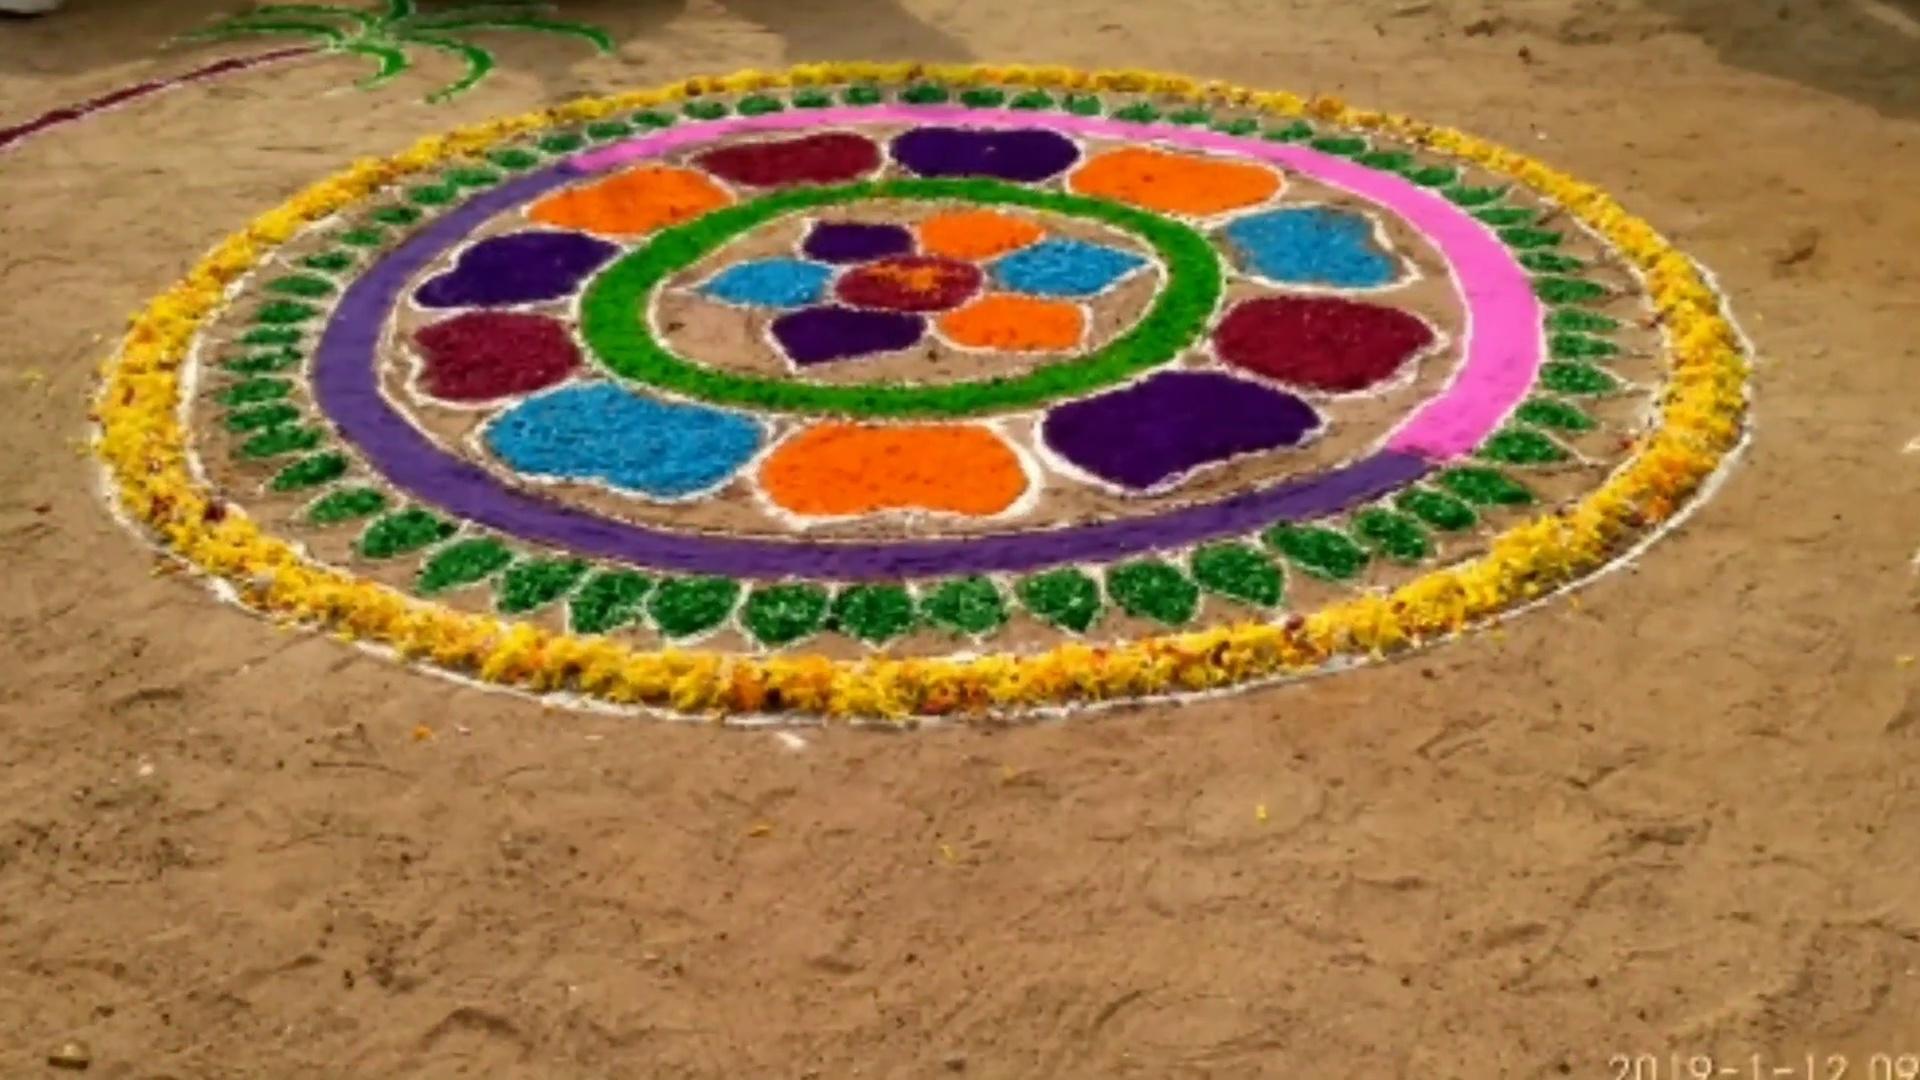 Sankranthi celebrations | sankrathi festival in Telugu | sankrathi games in schools | gaming competition in schools | sports competition in schools | festival celebrations in schools Telugu | pongal celebrations in schools Telugu | pongal celebrations